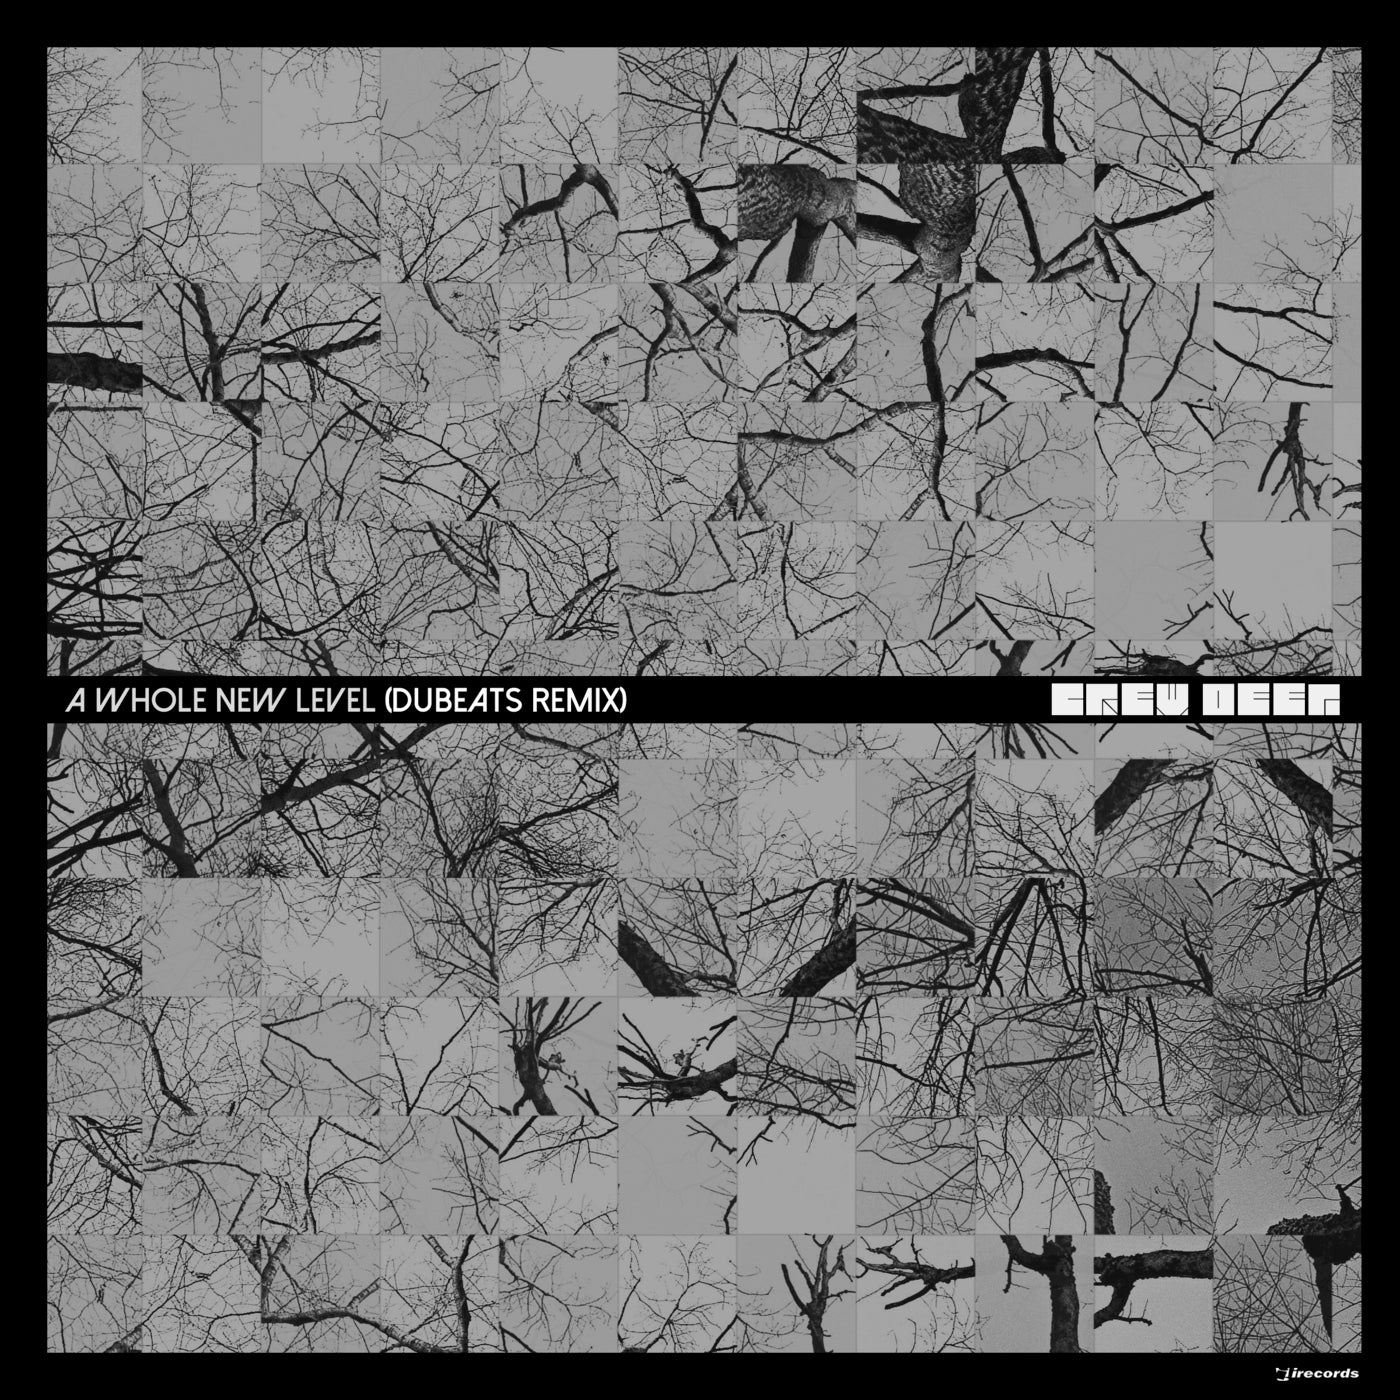 A Whole New Level (DuBeats Remix)